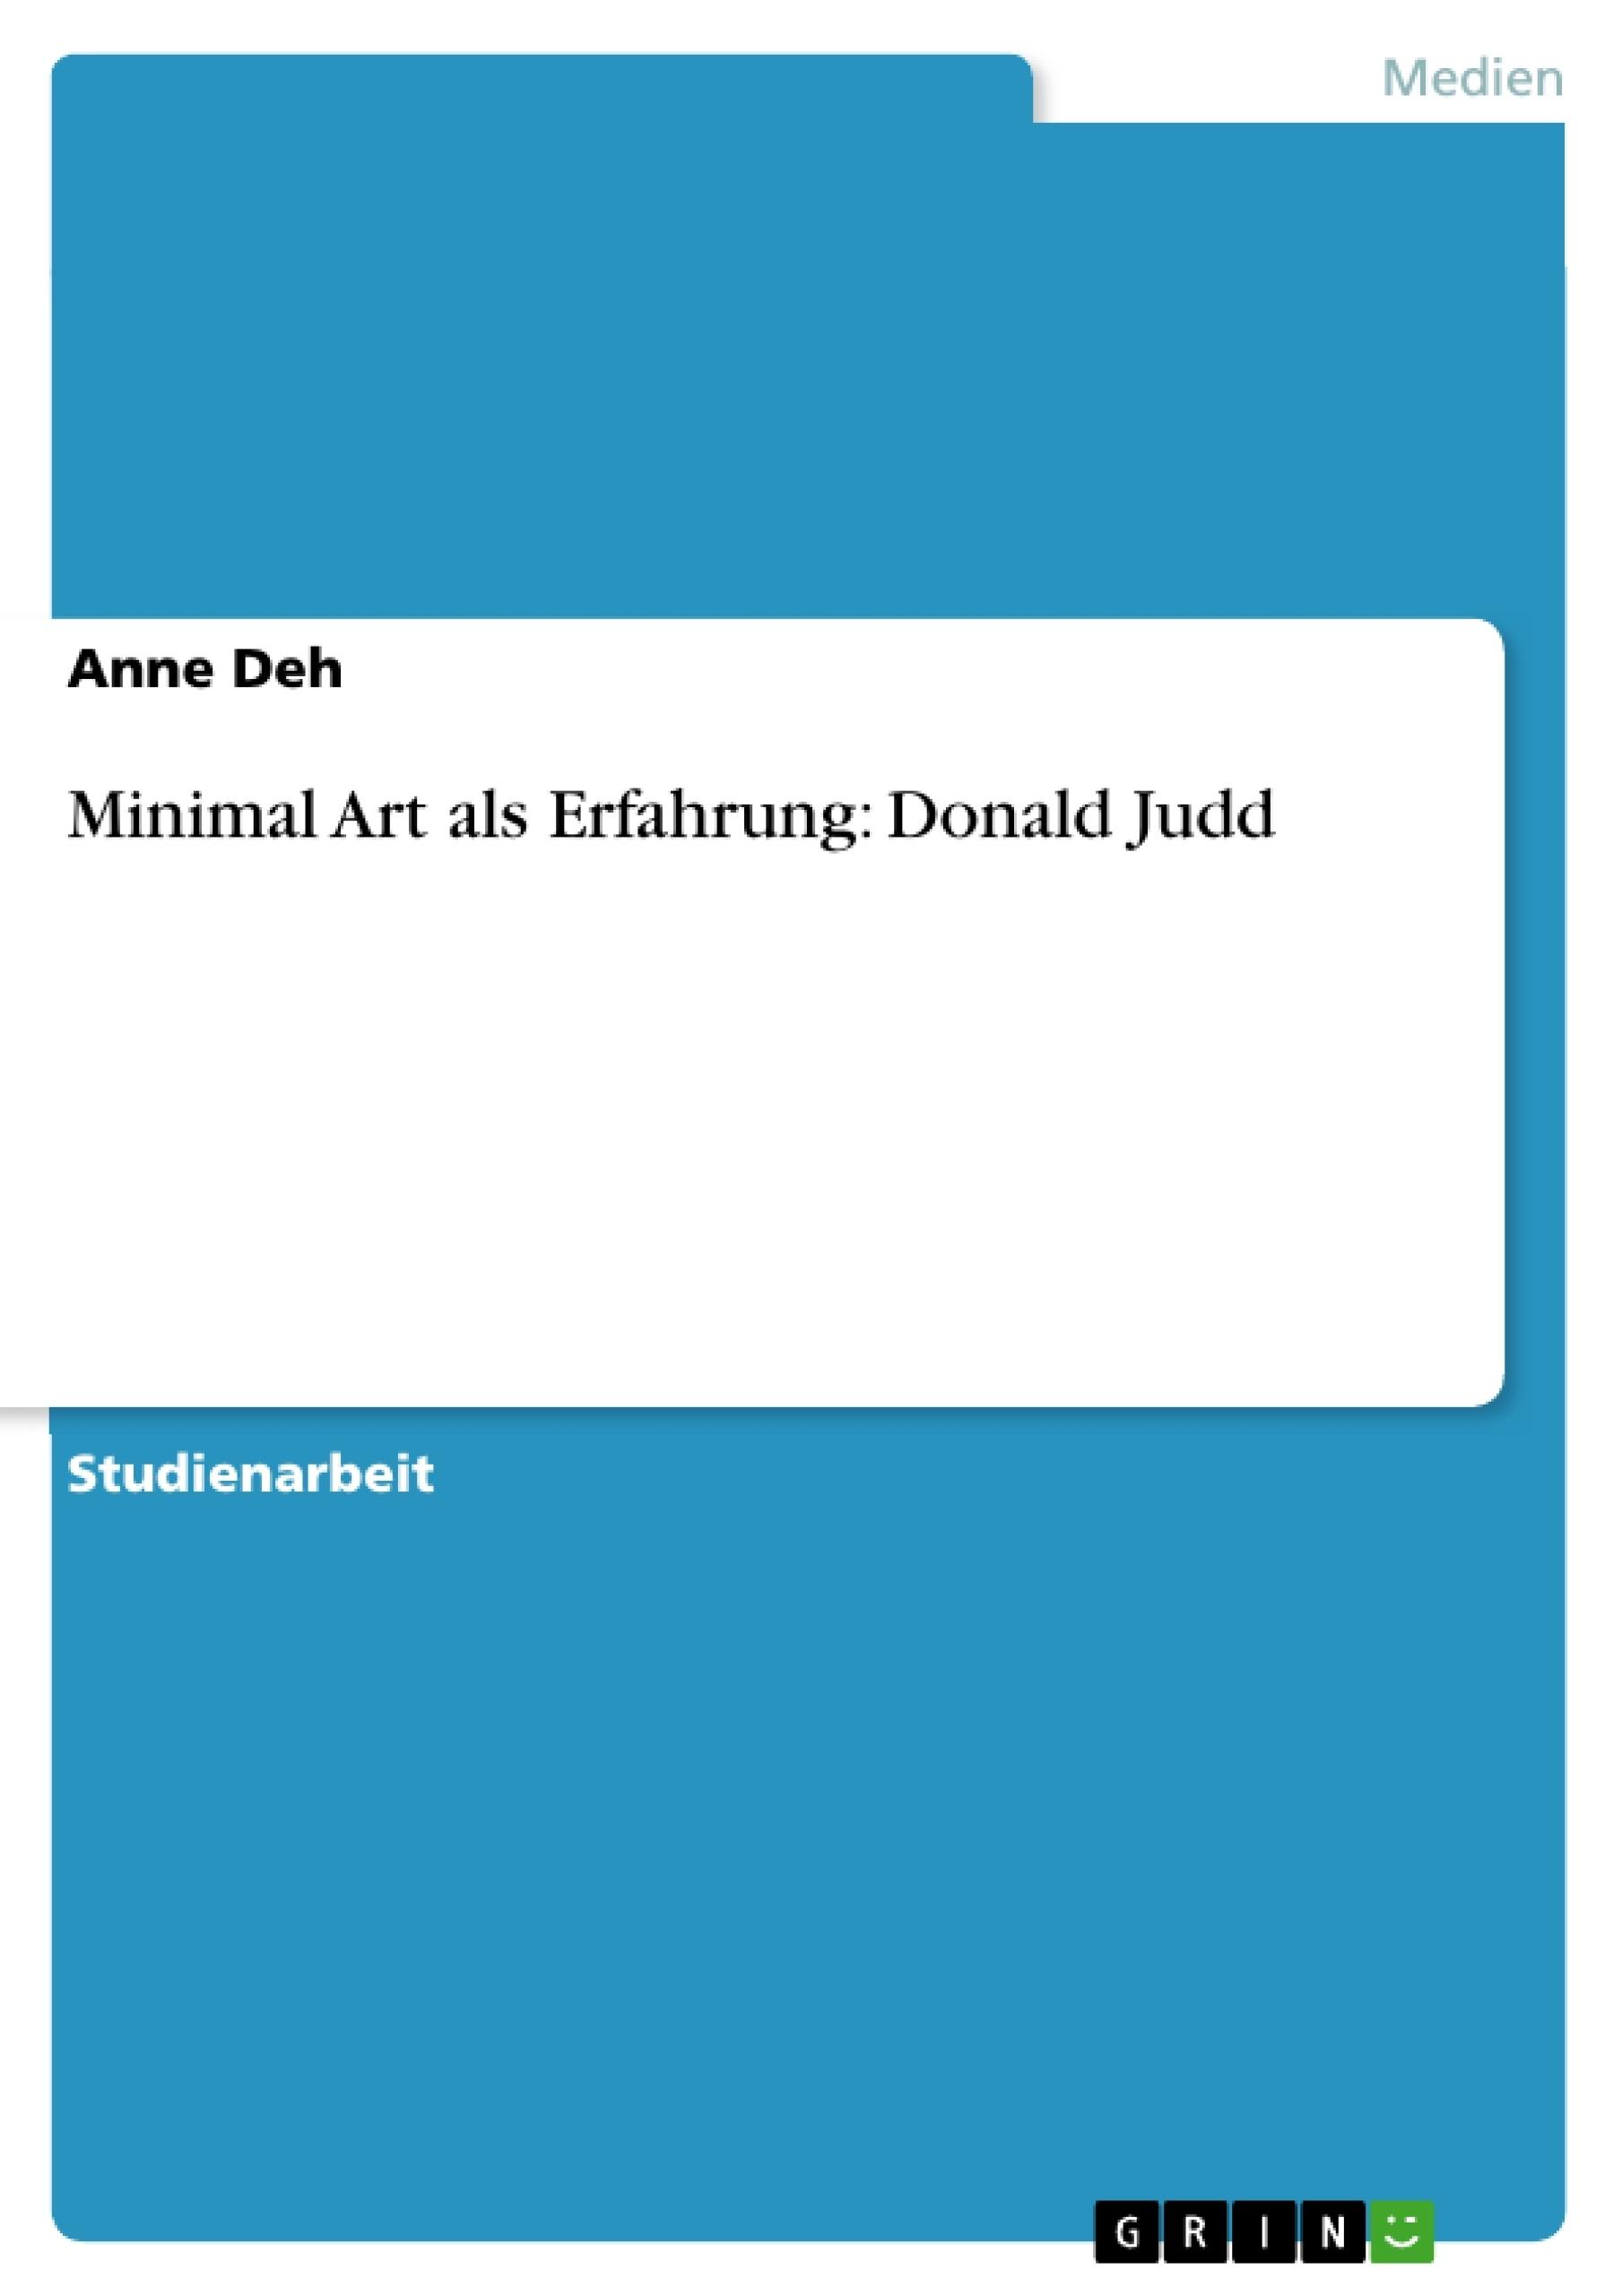 Titel: Minimal Art als Erfahrung: Donald Judd